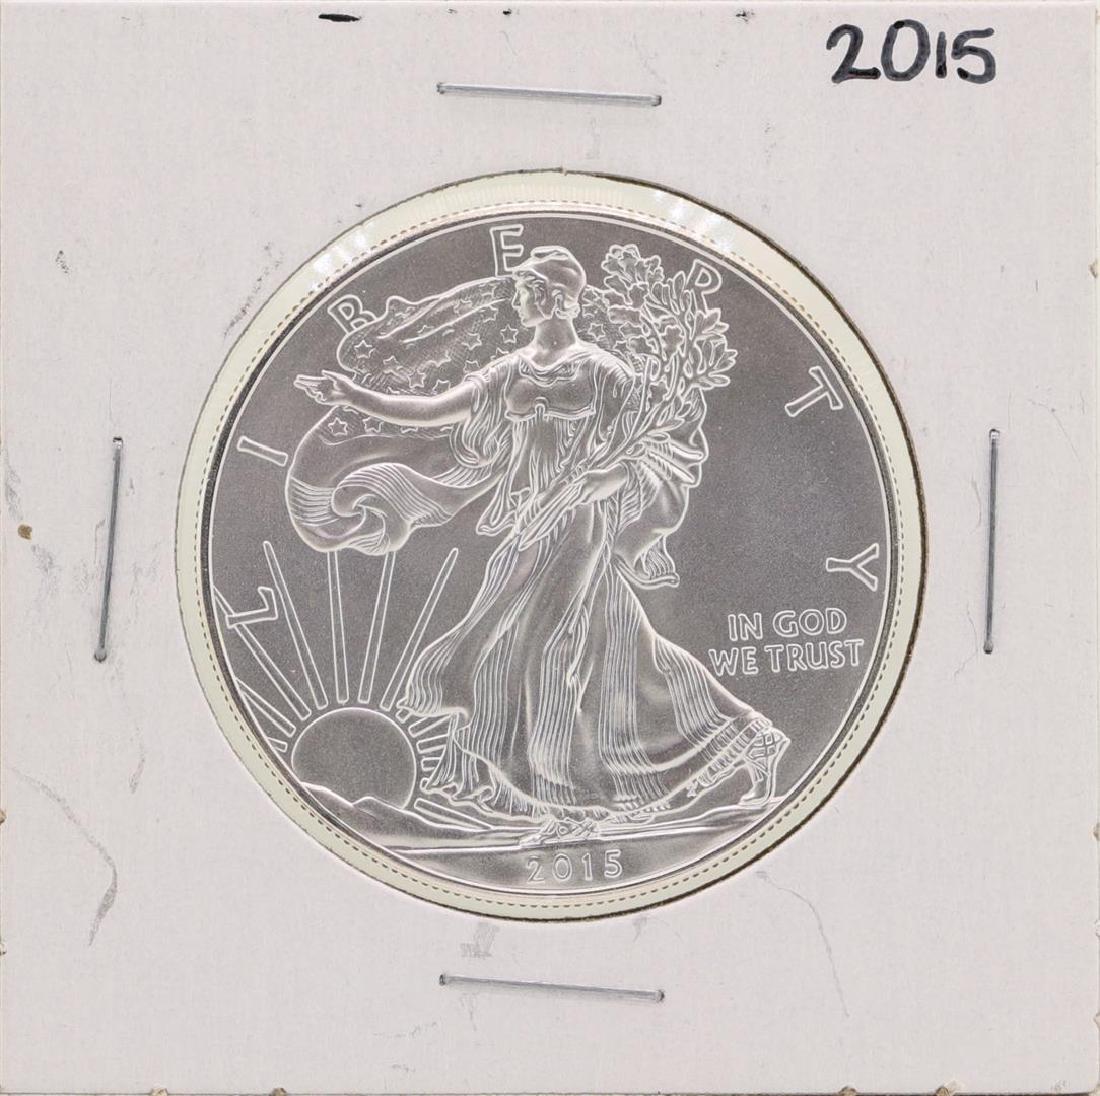 2015 $1 American Silver Eagle Coin